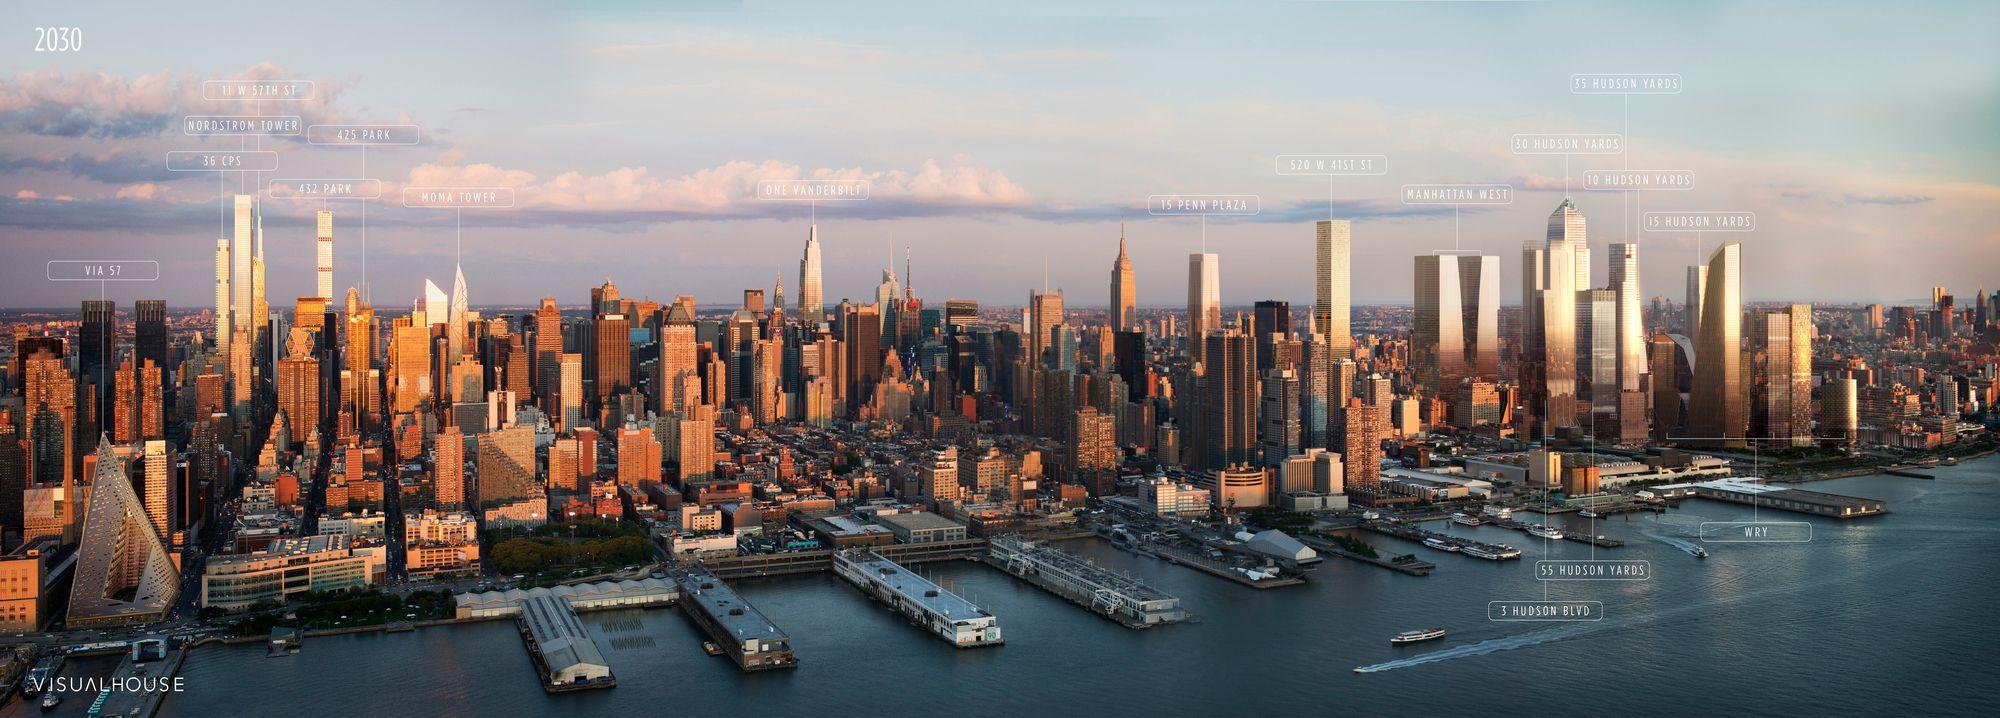 New York 2030 This Annotated Visualization Shows Us The Manhattan Of The Future Nyc Skyline Manhattan Skyline Future City